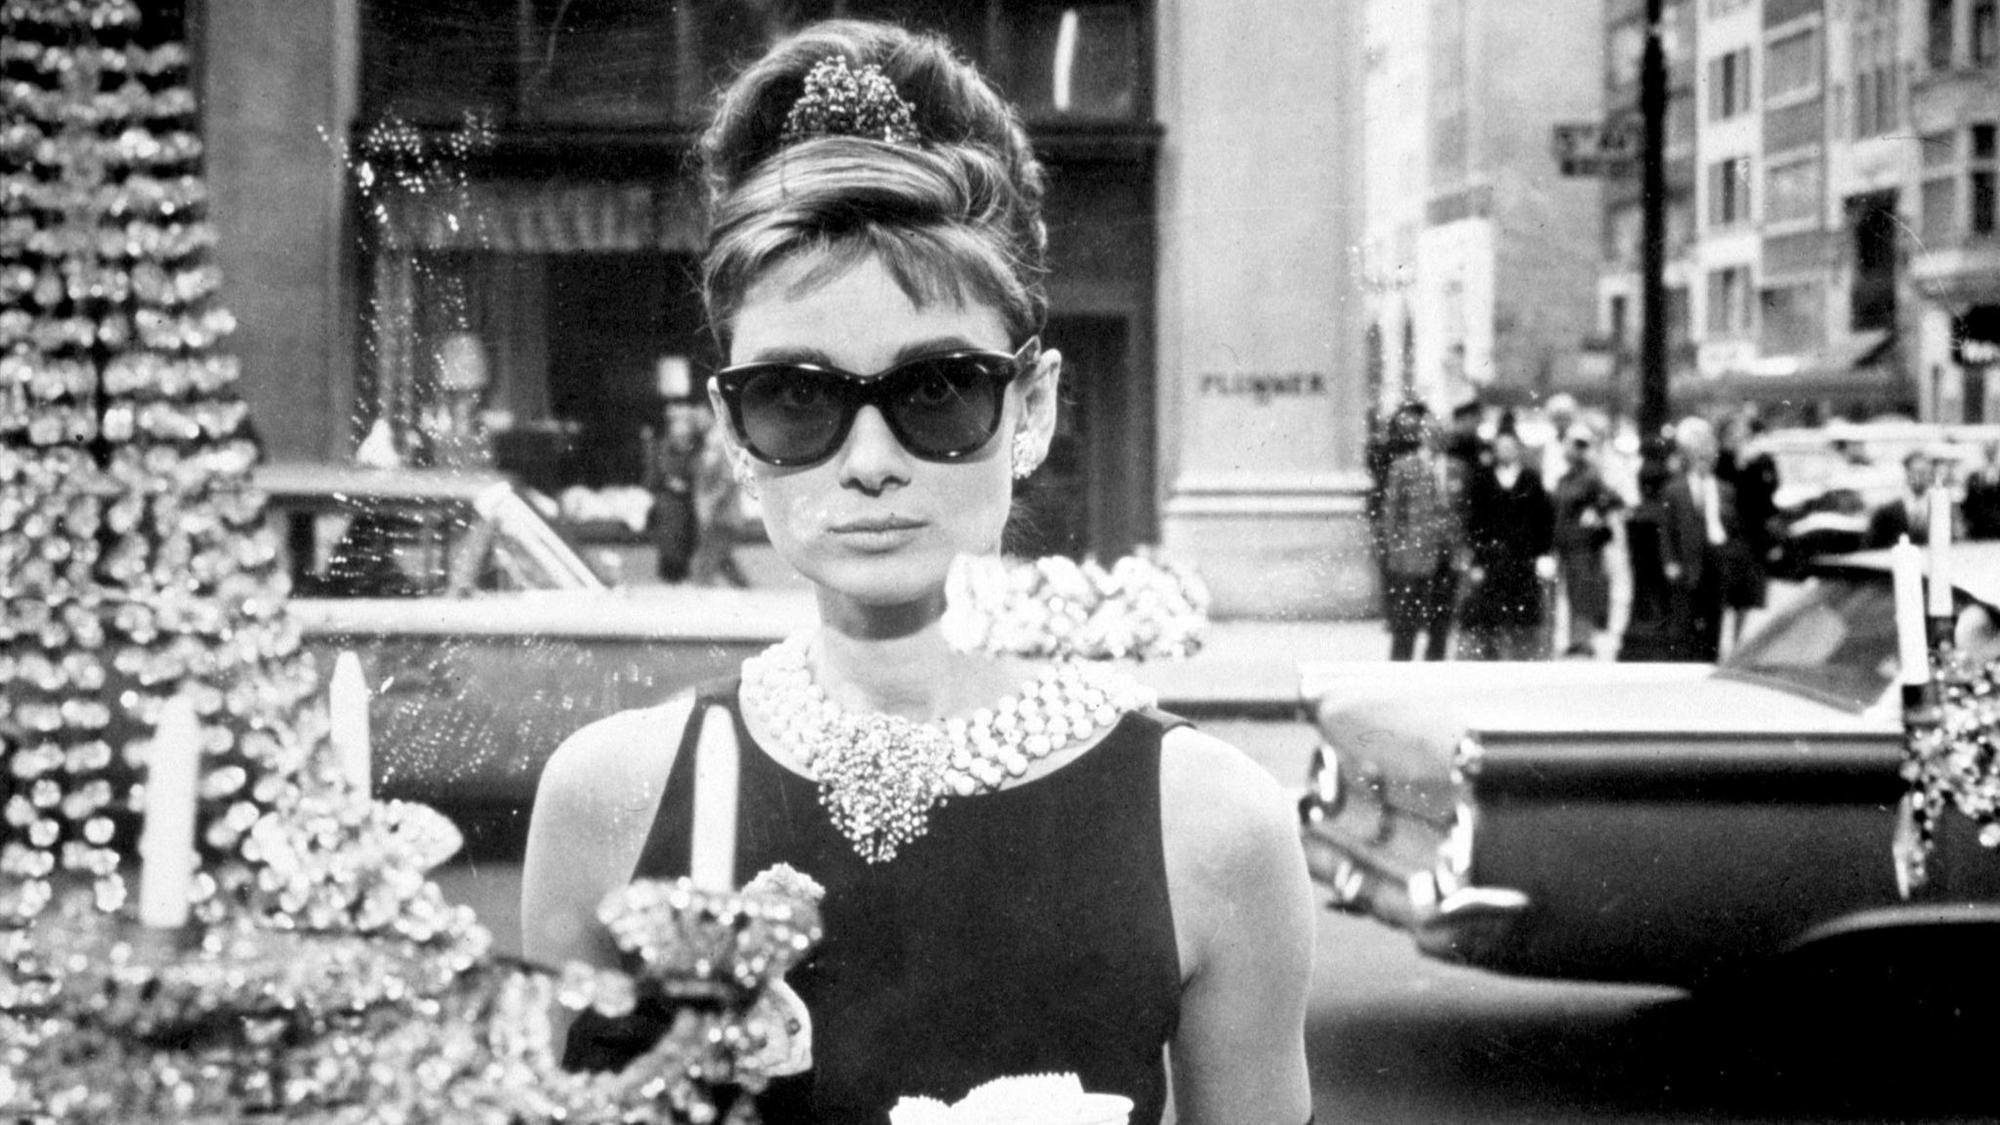 8138f8531de4 Party like Audrey Hepburn at this  Breakfast at Tiffany s  pop-up. Holly At  Tiffany s